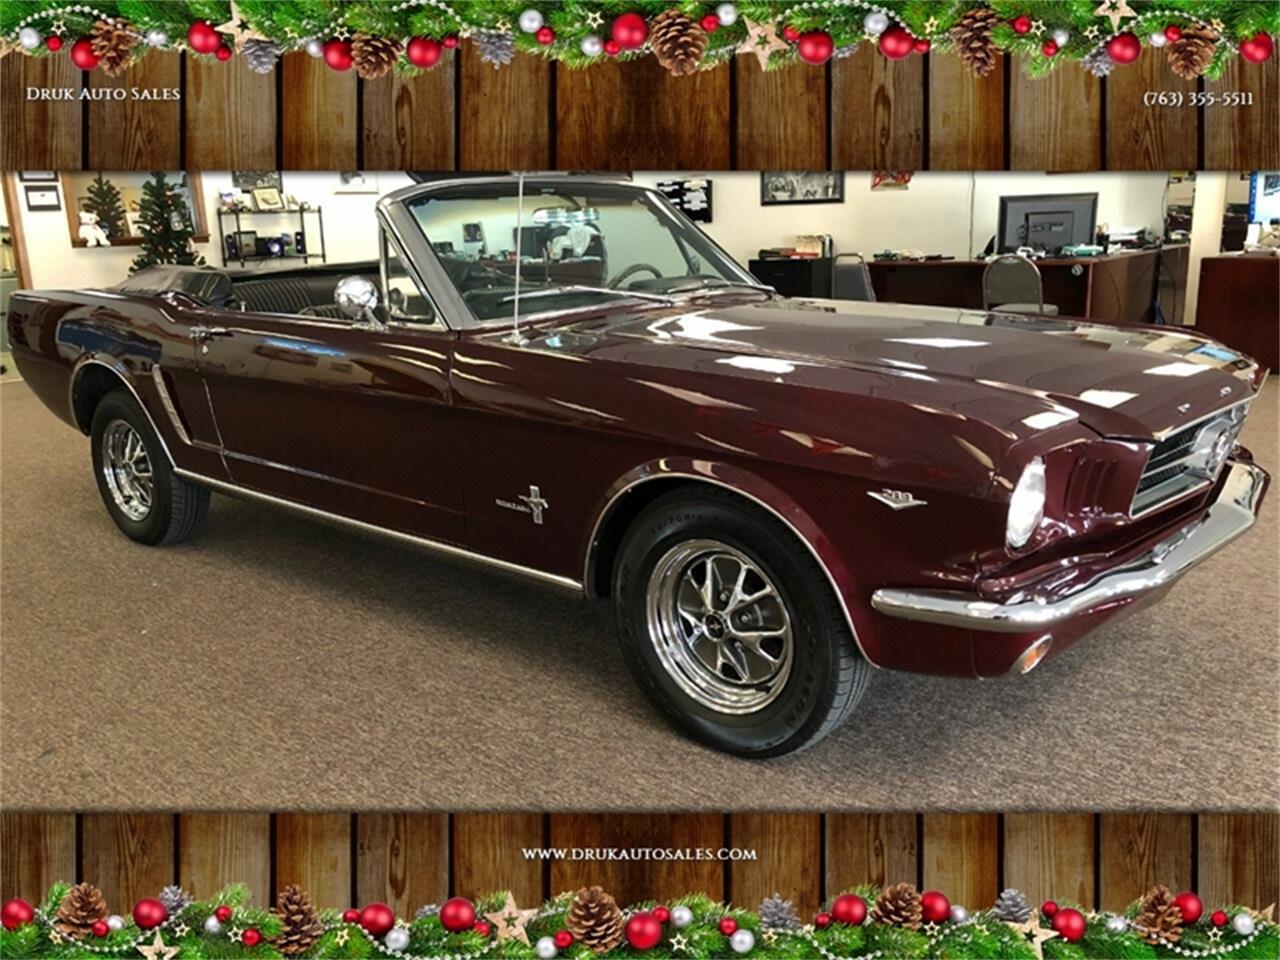 Ford Mustang V8 289 1965 prix tout compris 1965